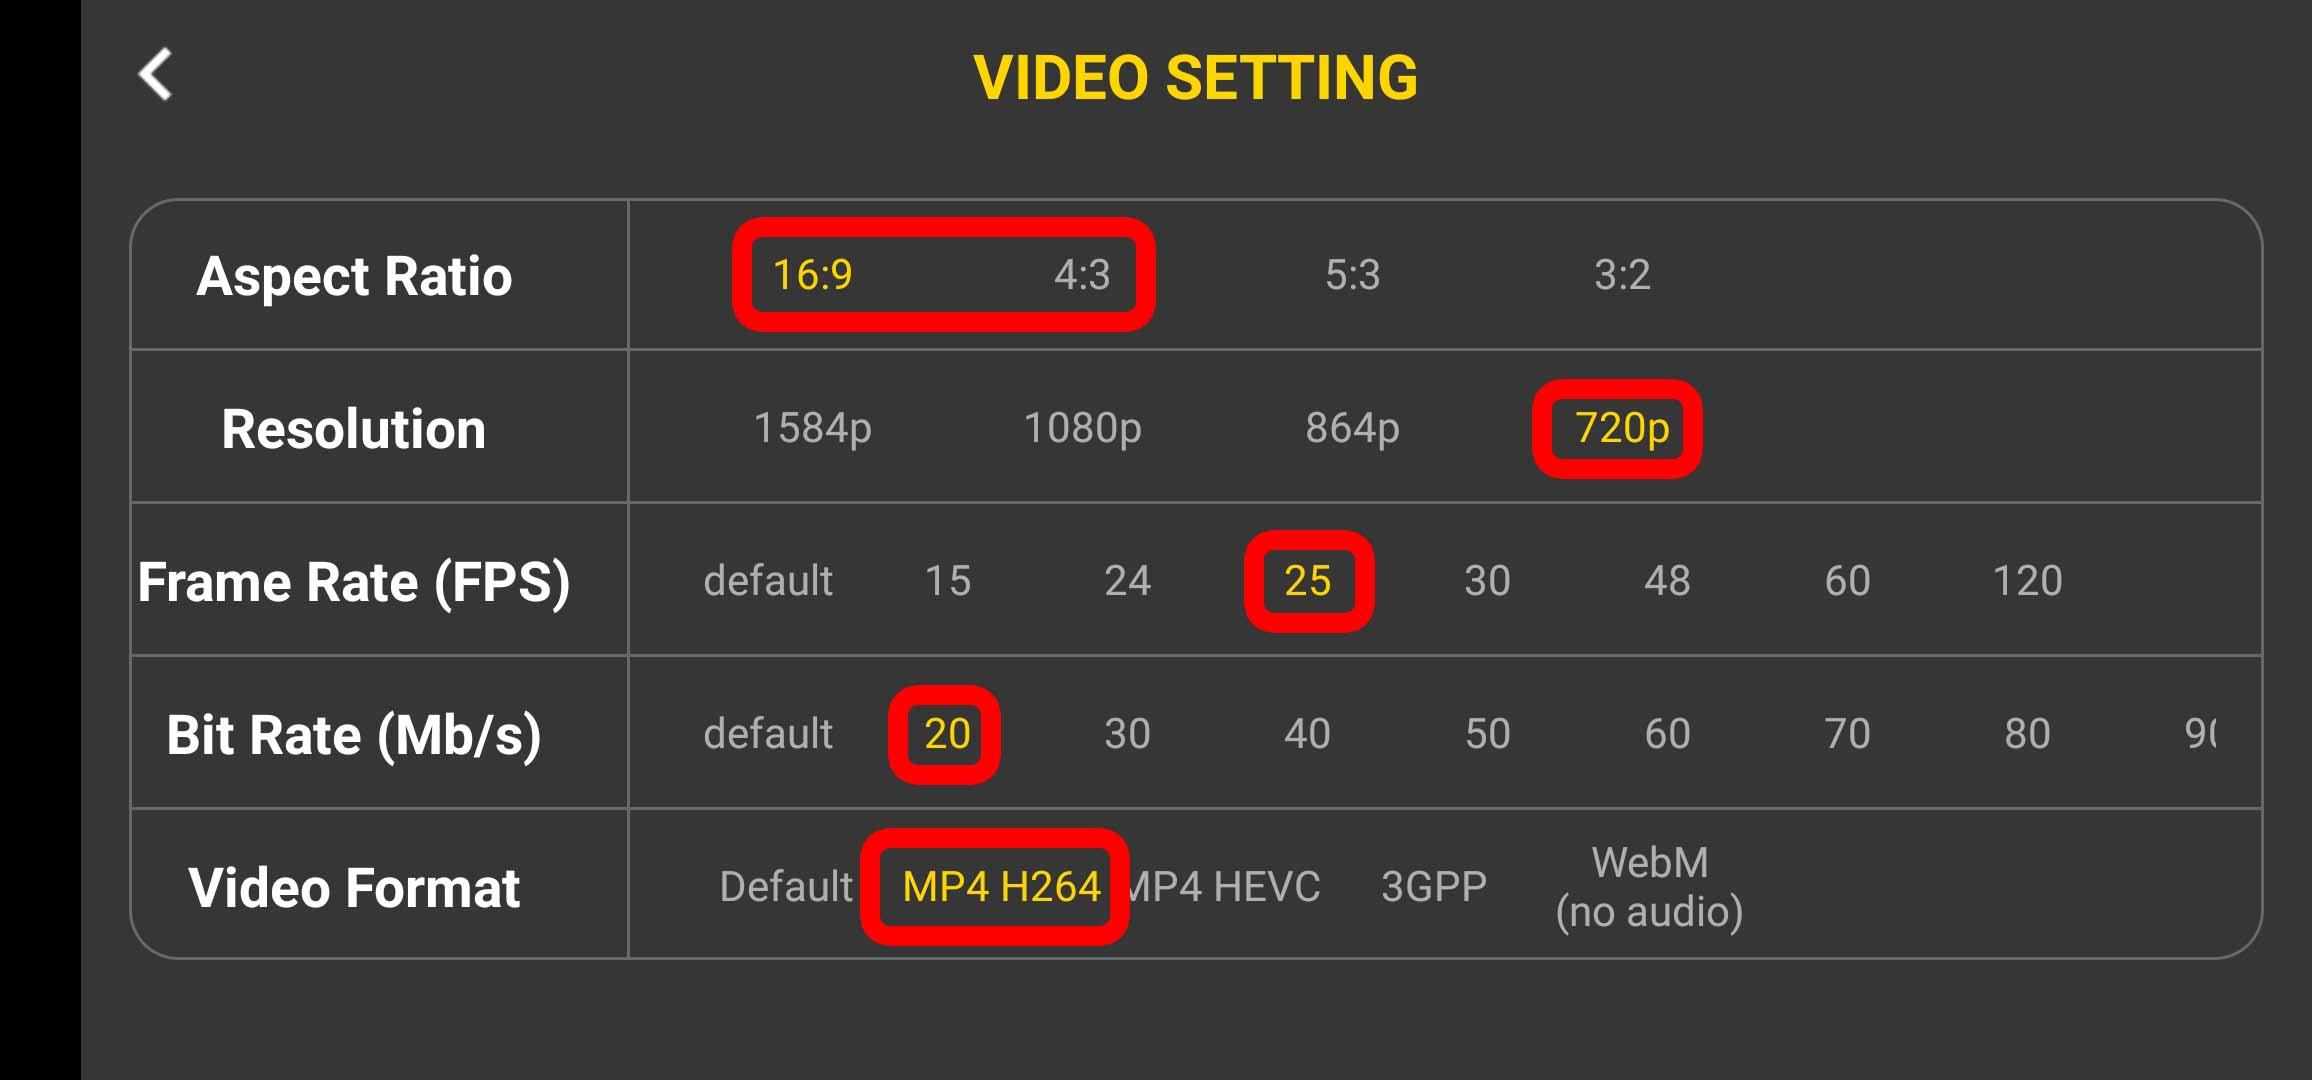 4k Camera Pro - Einstellungen bei Video-Settings